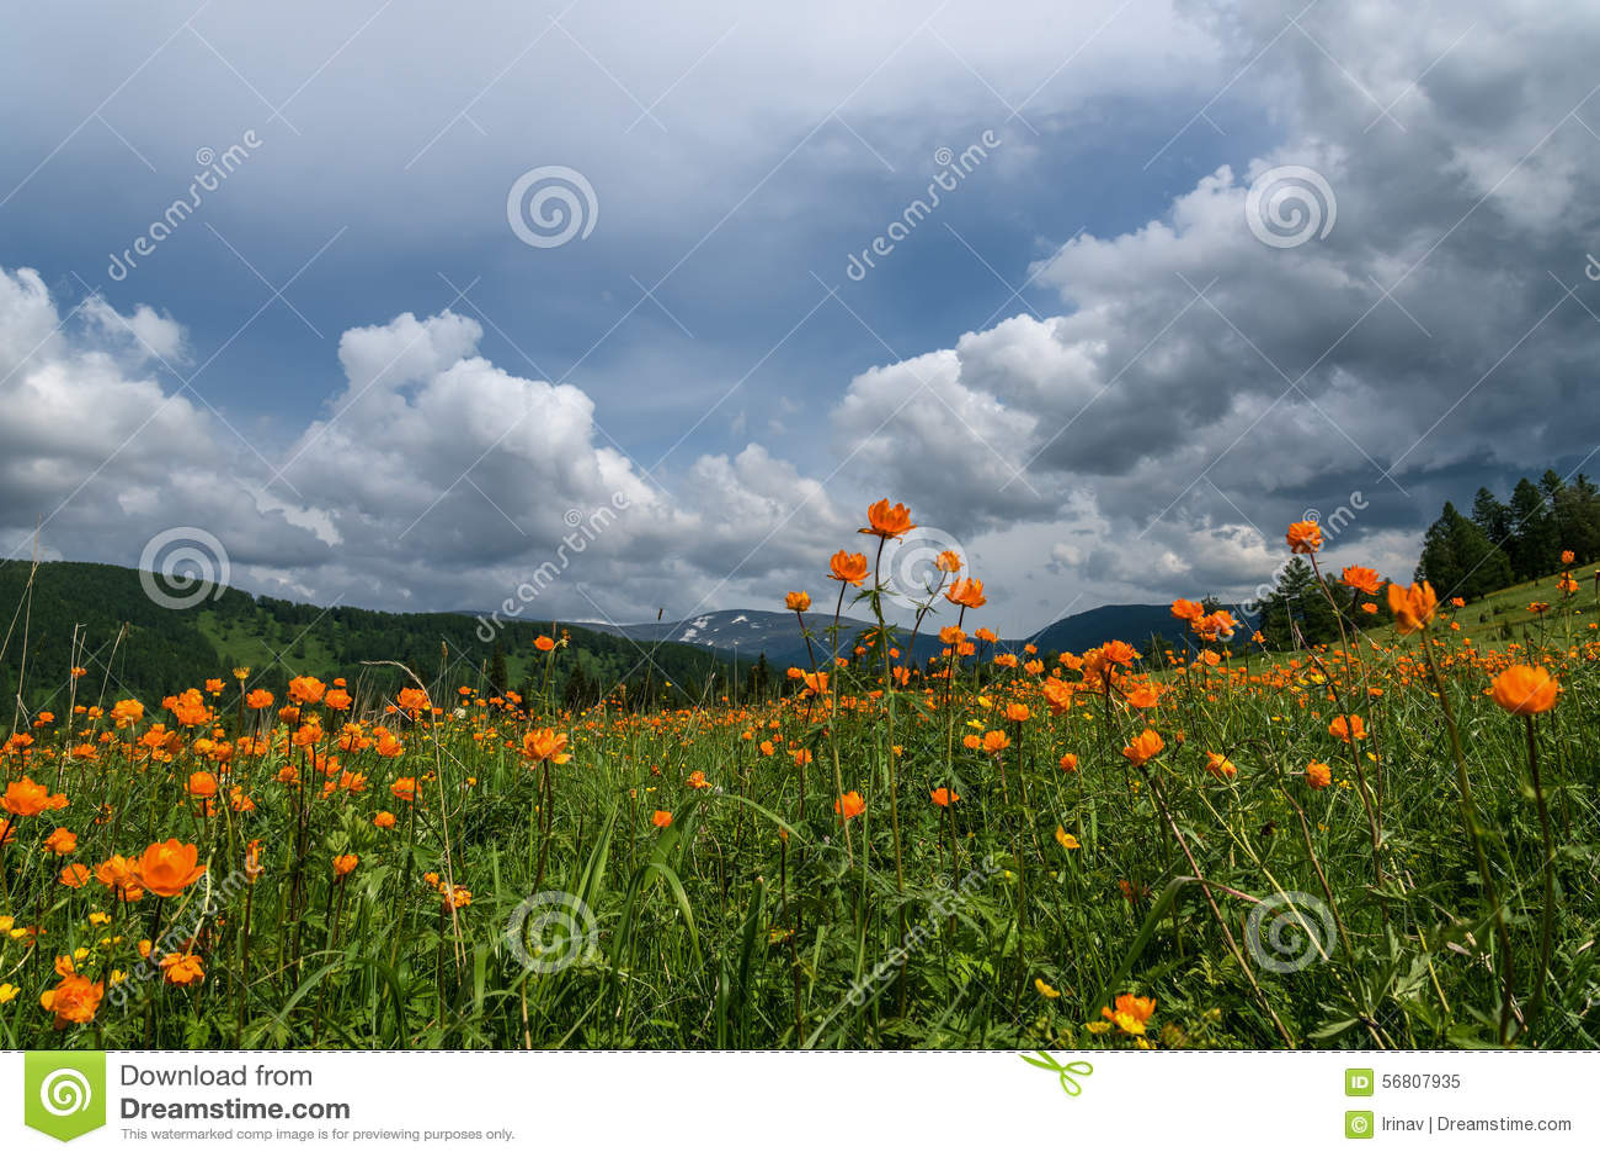 Orange Flowers Meadow Mountains Stock Image